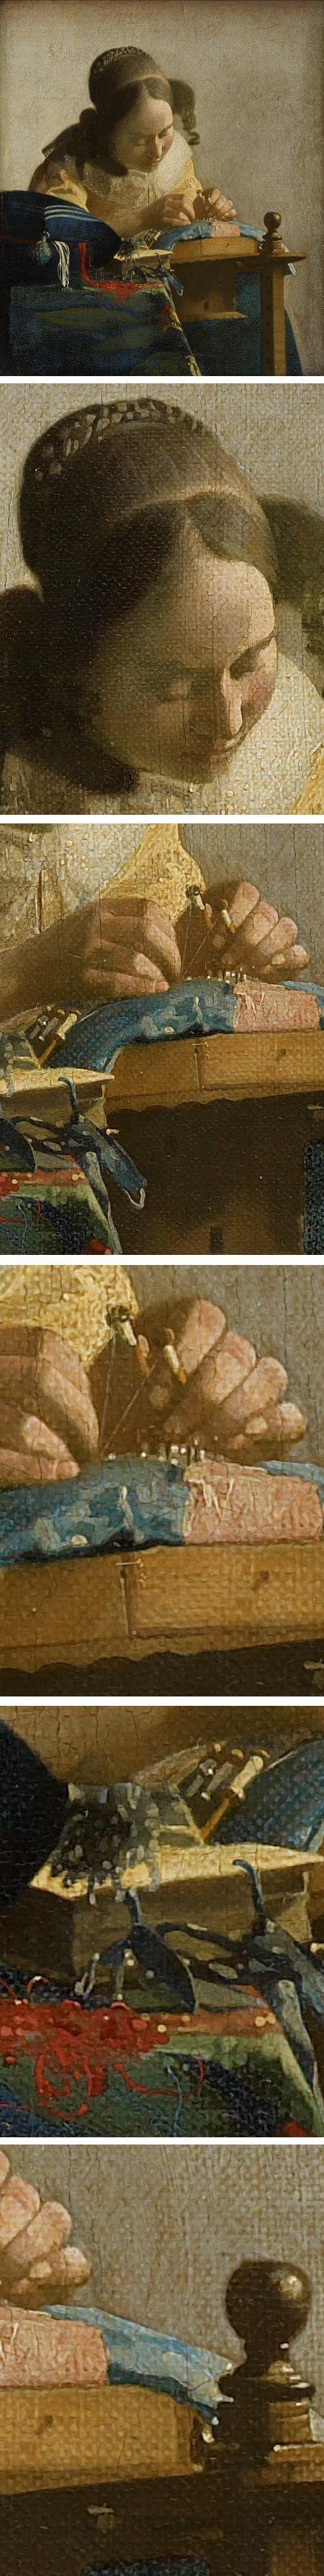 Vermeer's The Lacemaker Beautiful Art